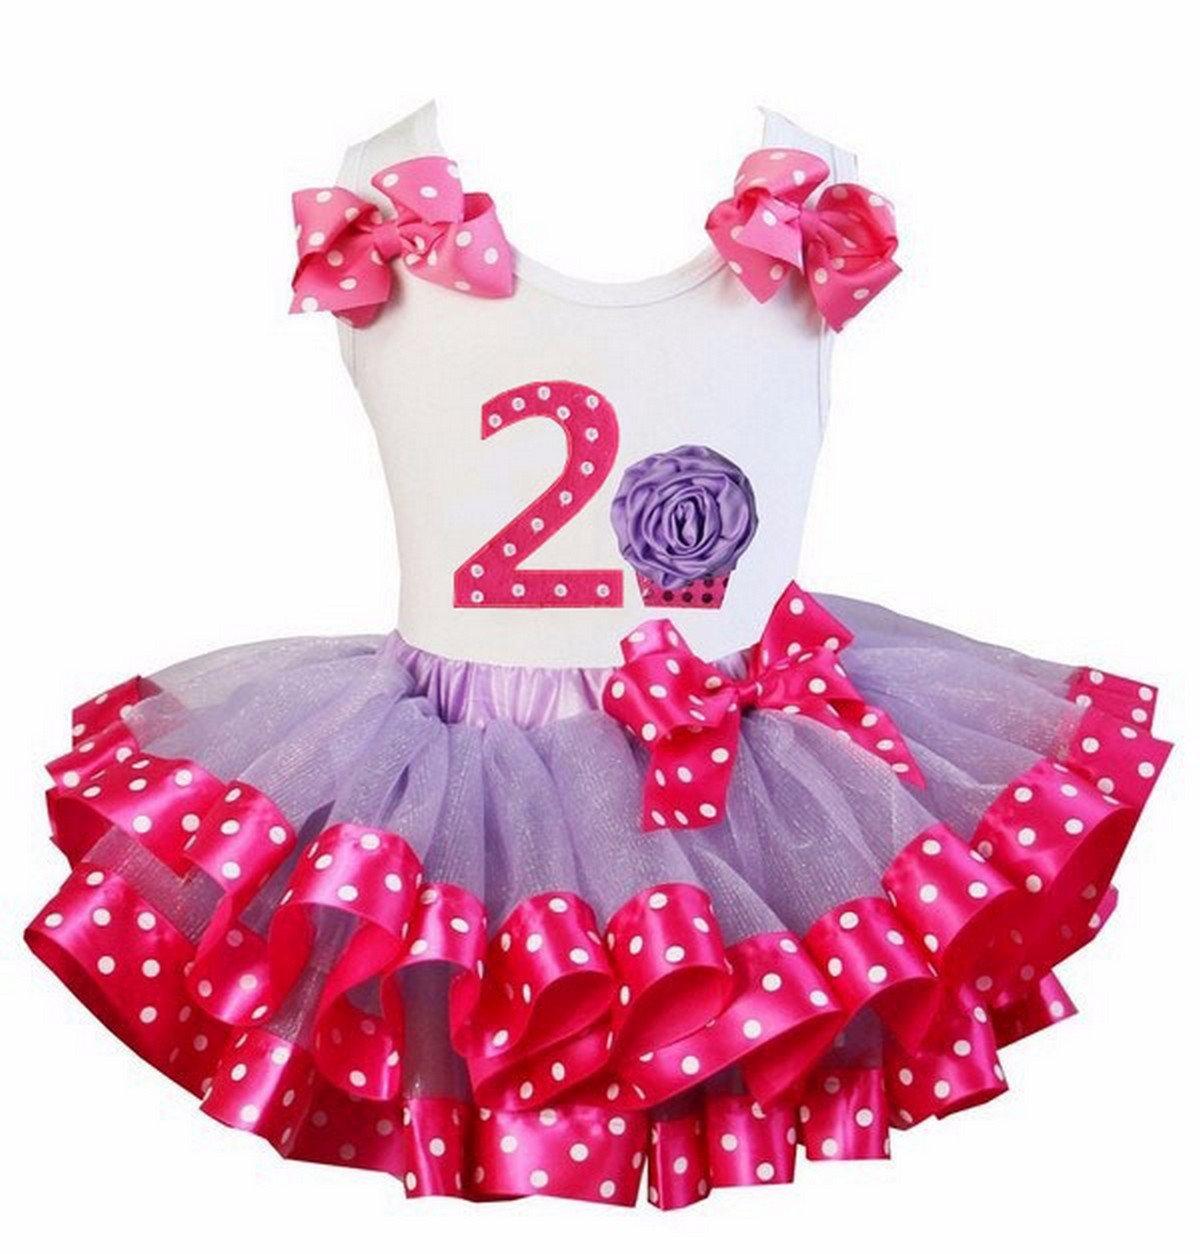 Kirei Sui Hot Pink Polka Dots Tutu 2nd Rosette Cupcake Tank Top Small Purple